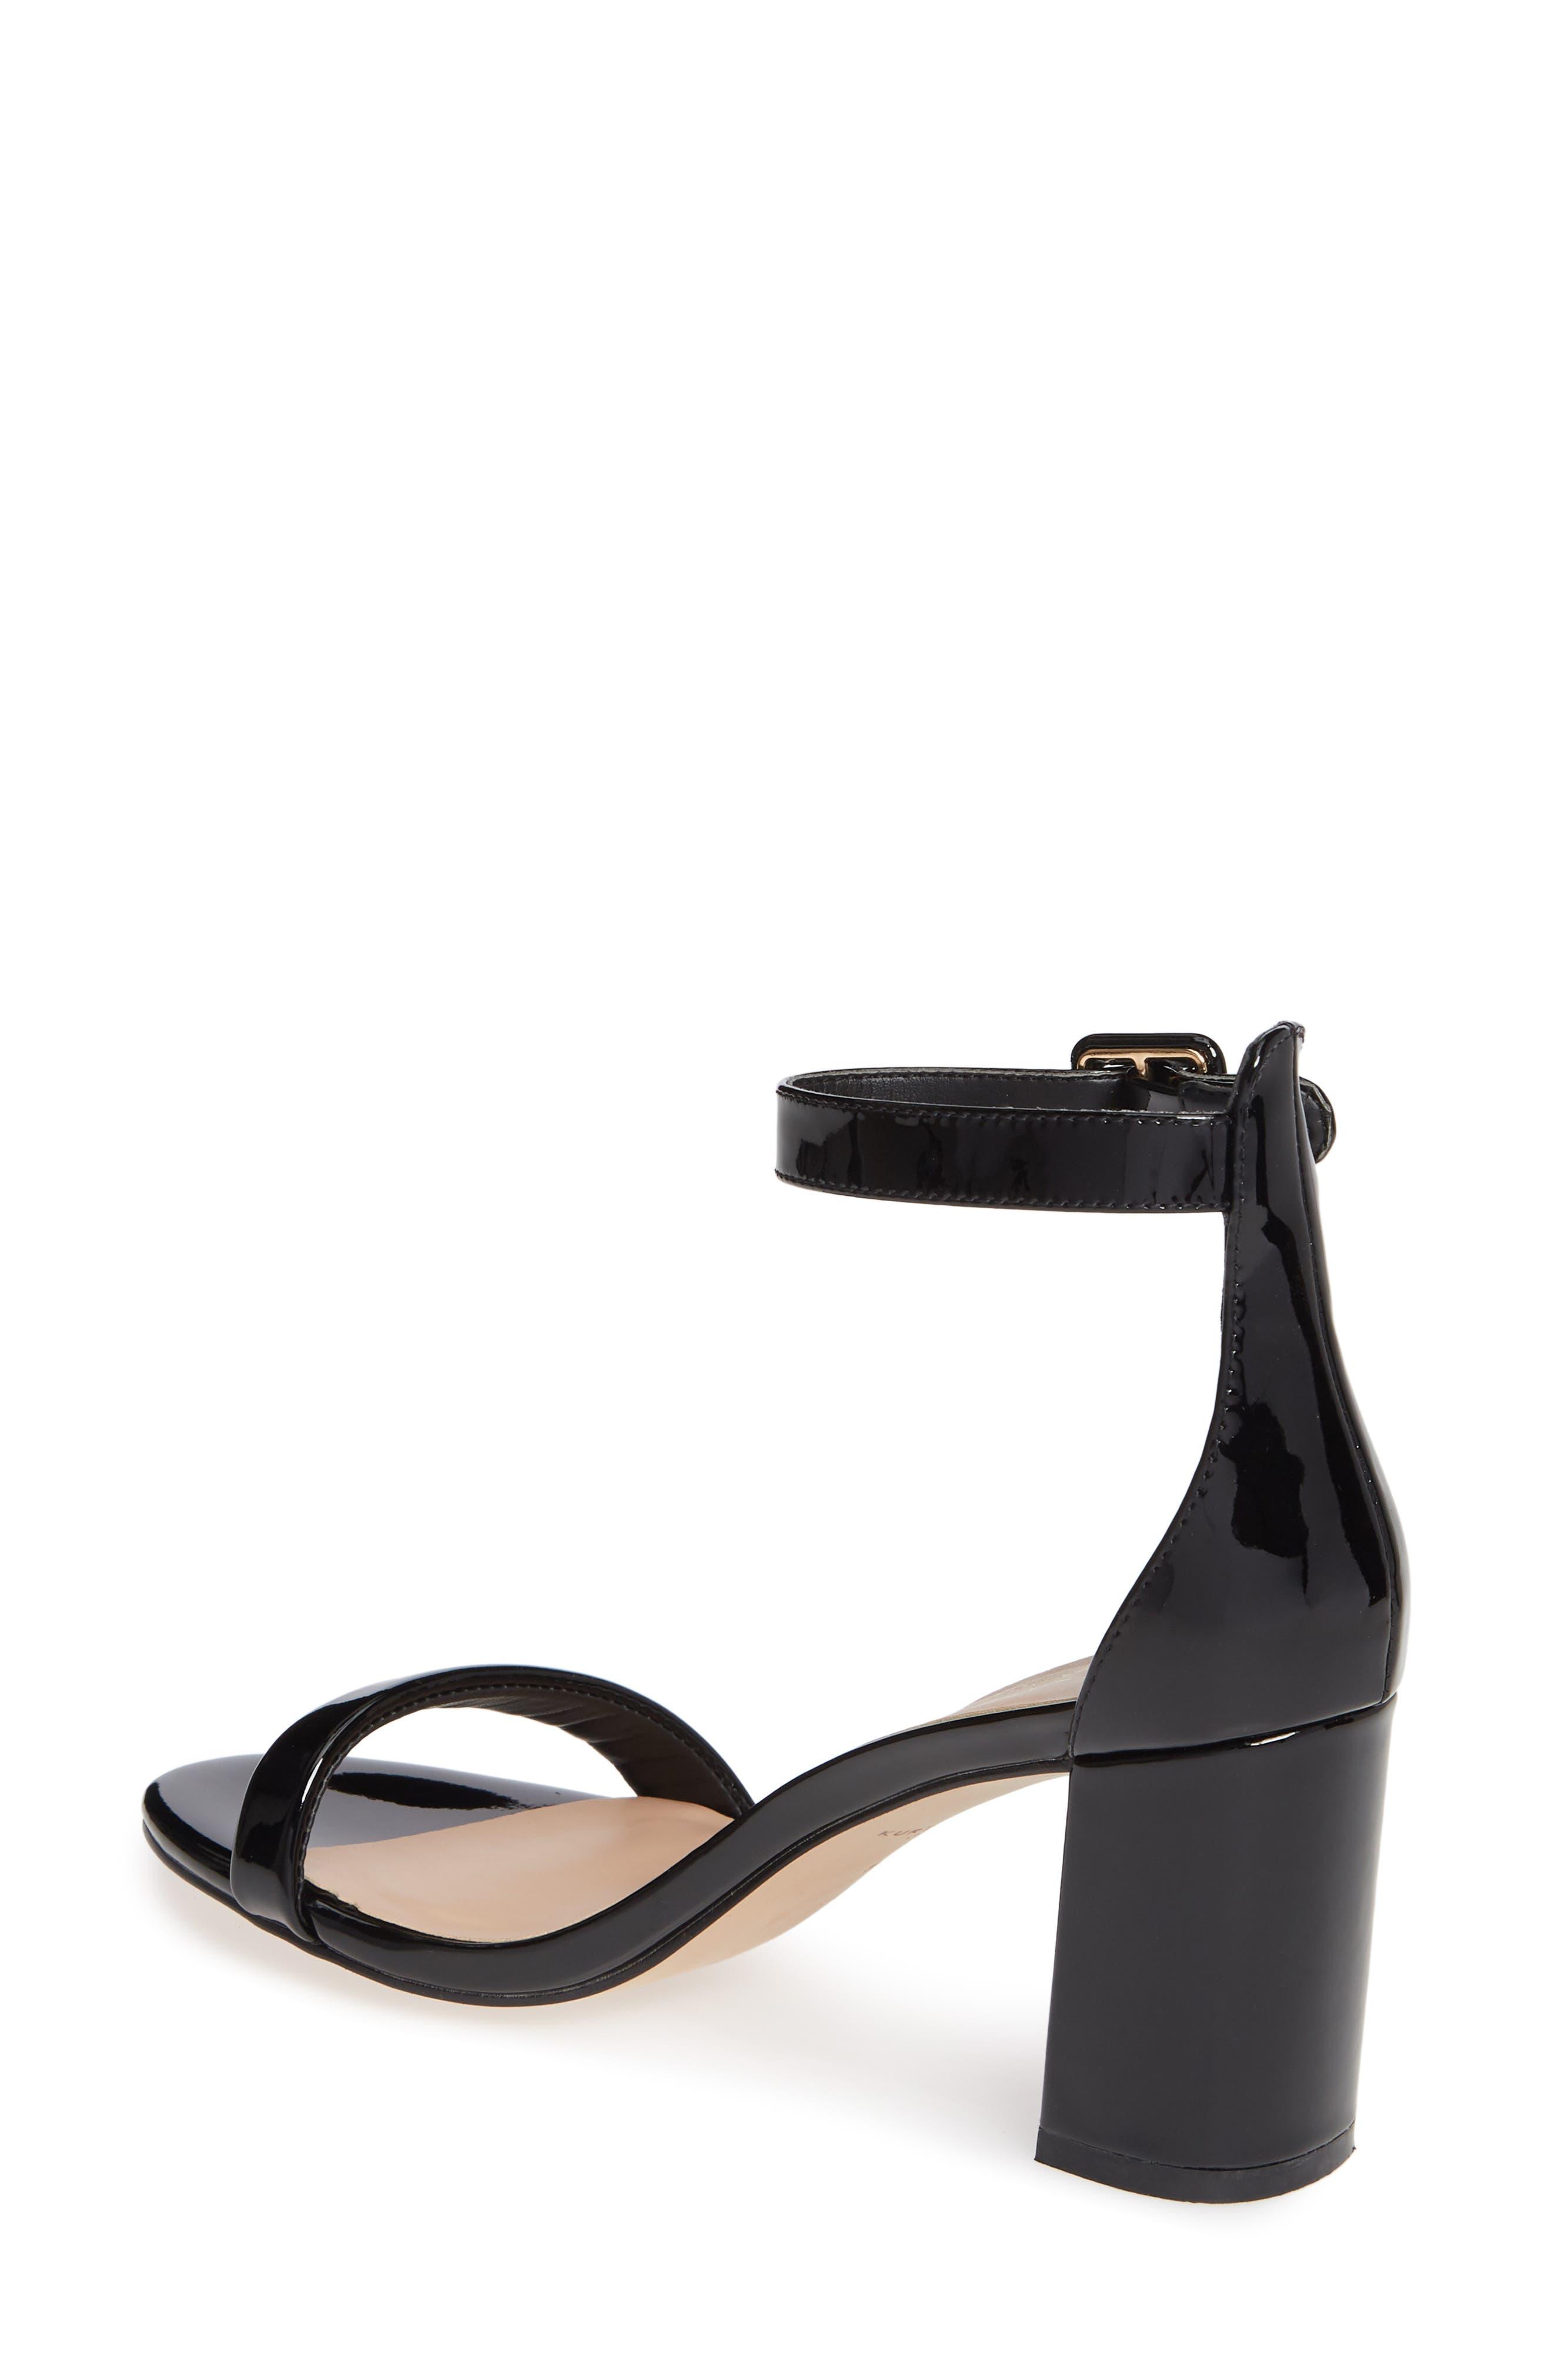 Langley Ankle Strap Sandal,                             Alternate thumbnail 2, color,                             BLACK LEATHER